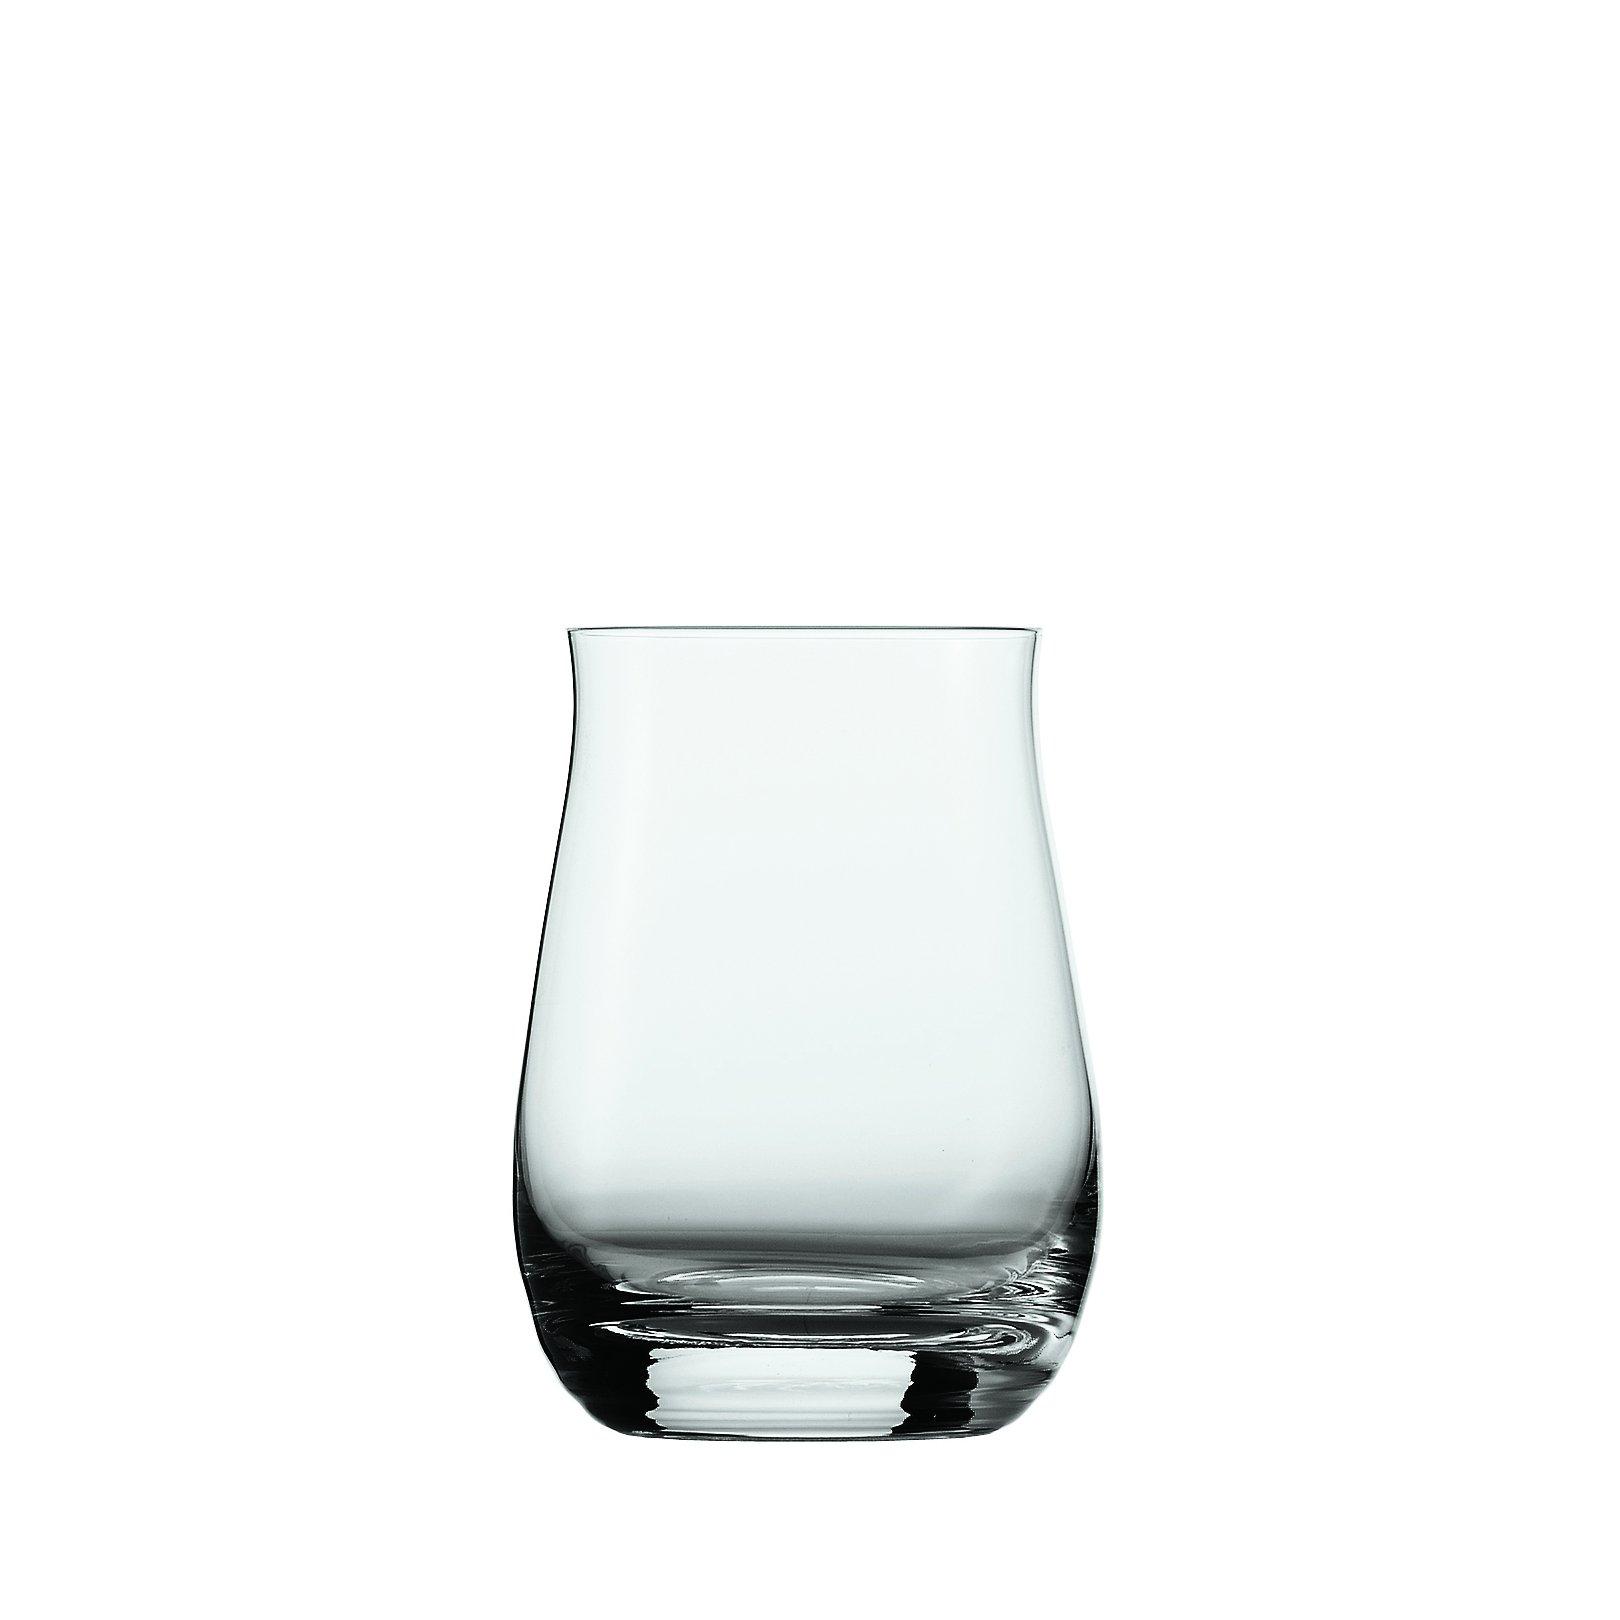 Spiegelau Single Barrel Bourbon (Set of 4), 12 oz, Clear